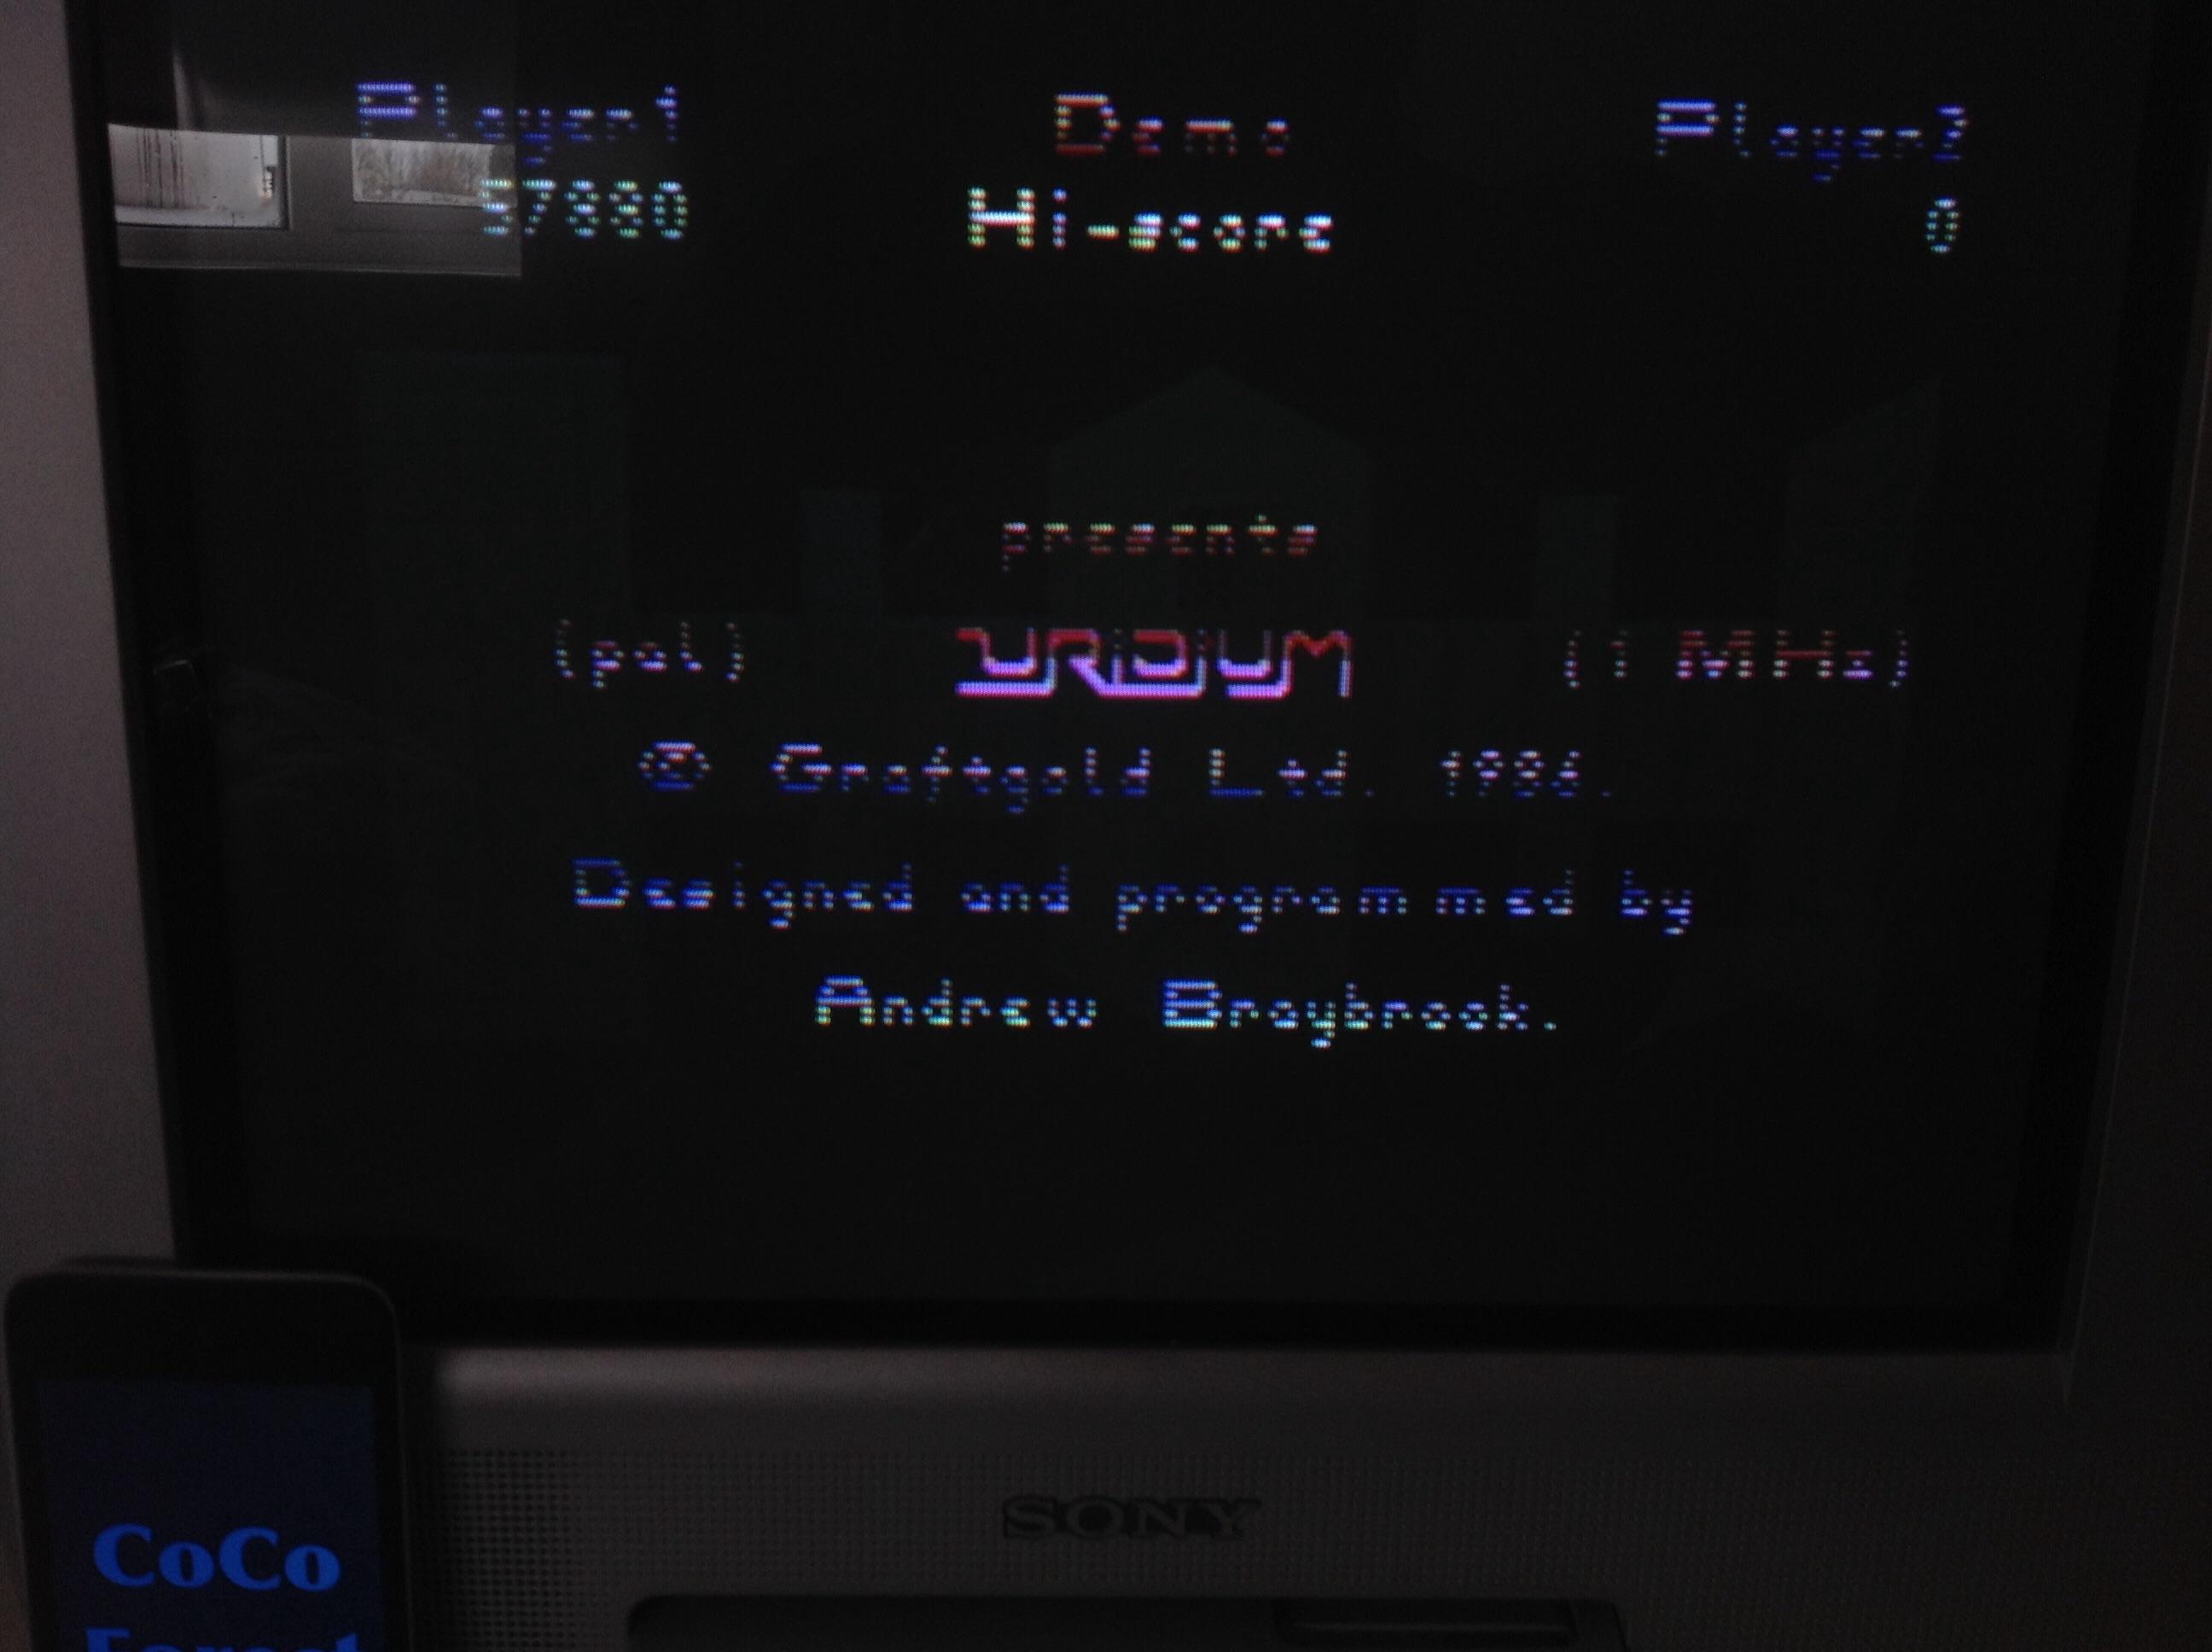 CoCoForest: Uridium Plus (Commodore 64) 57,880 points on 2015-03-24 05:27:40